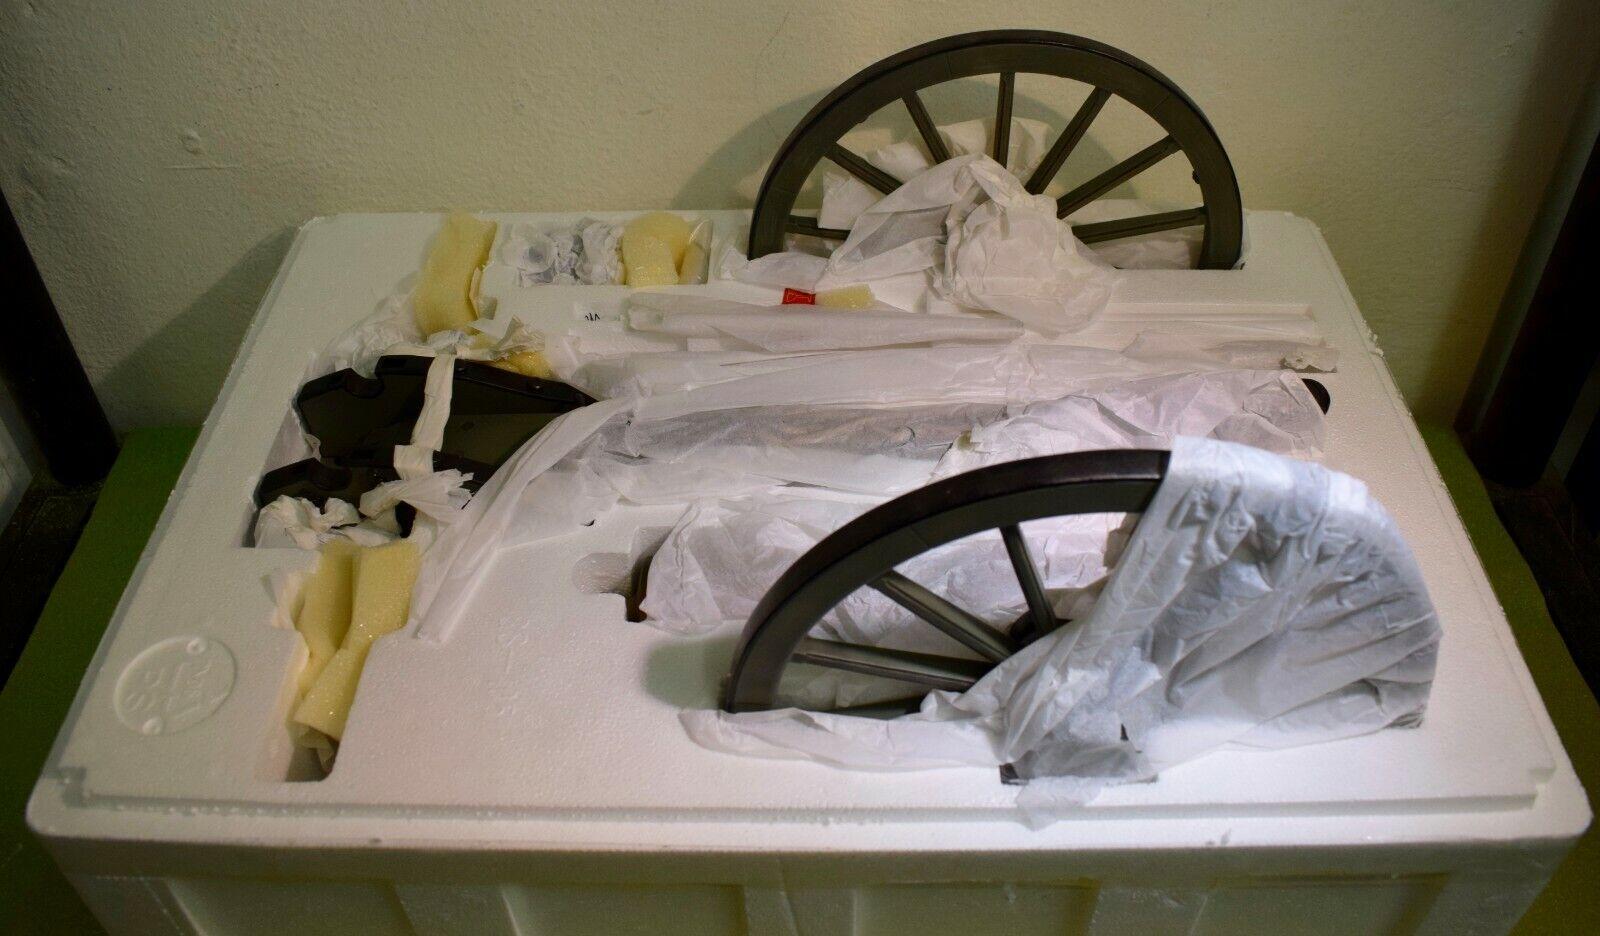 SIDESHOW 1 6 SCALE AMERICAN CIVIL WAR ERA CANNON - 1841 FIELD GUN